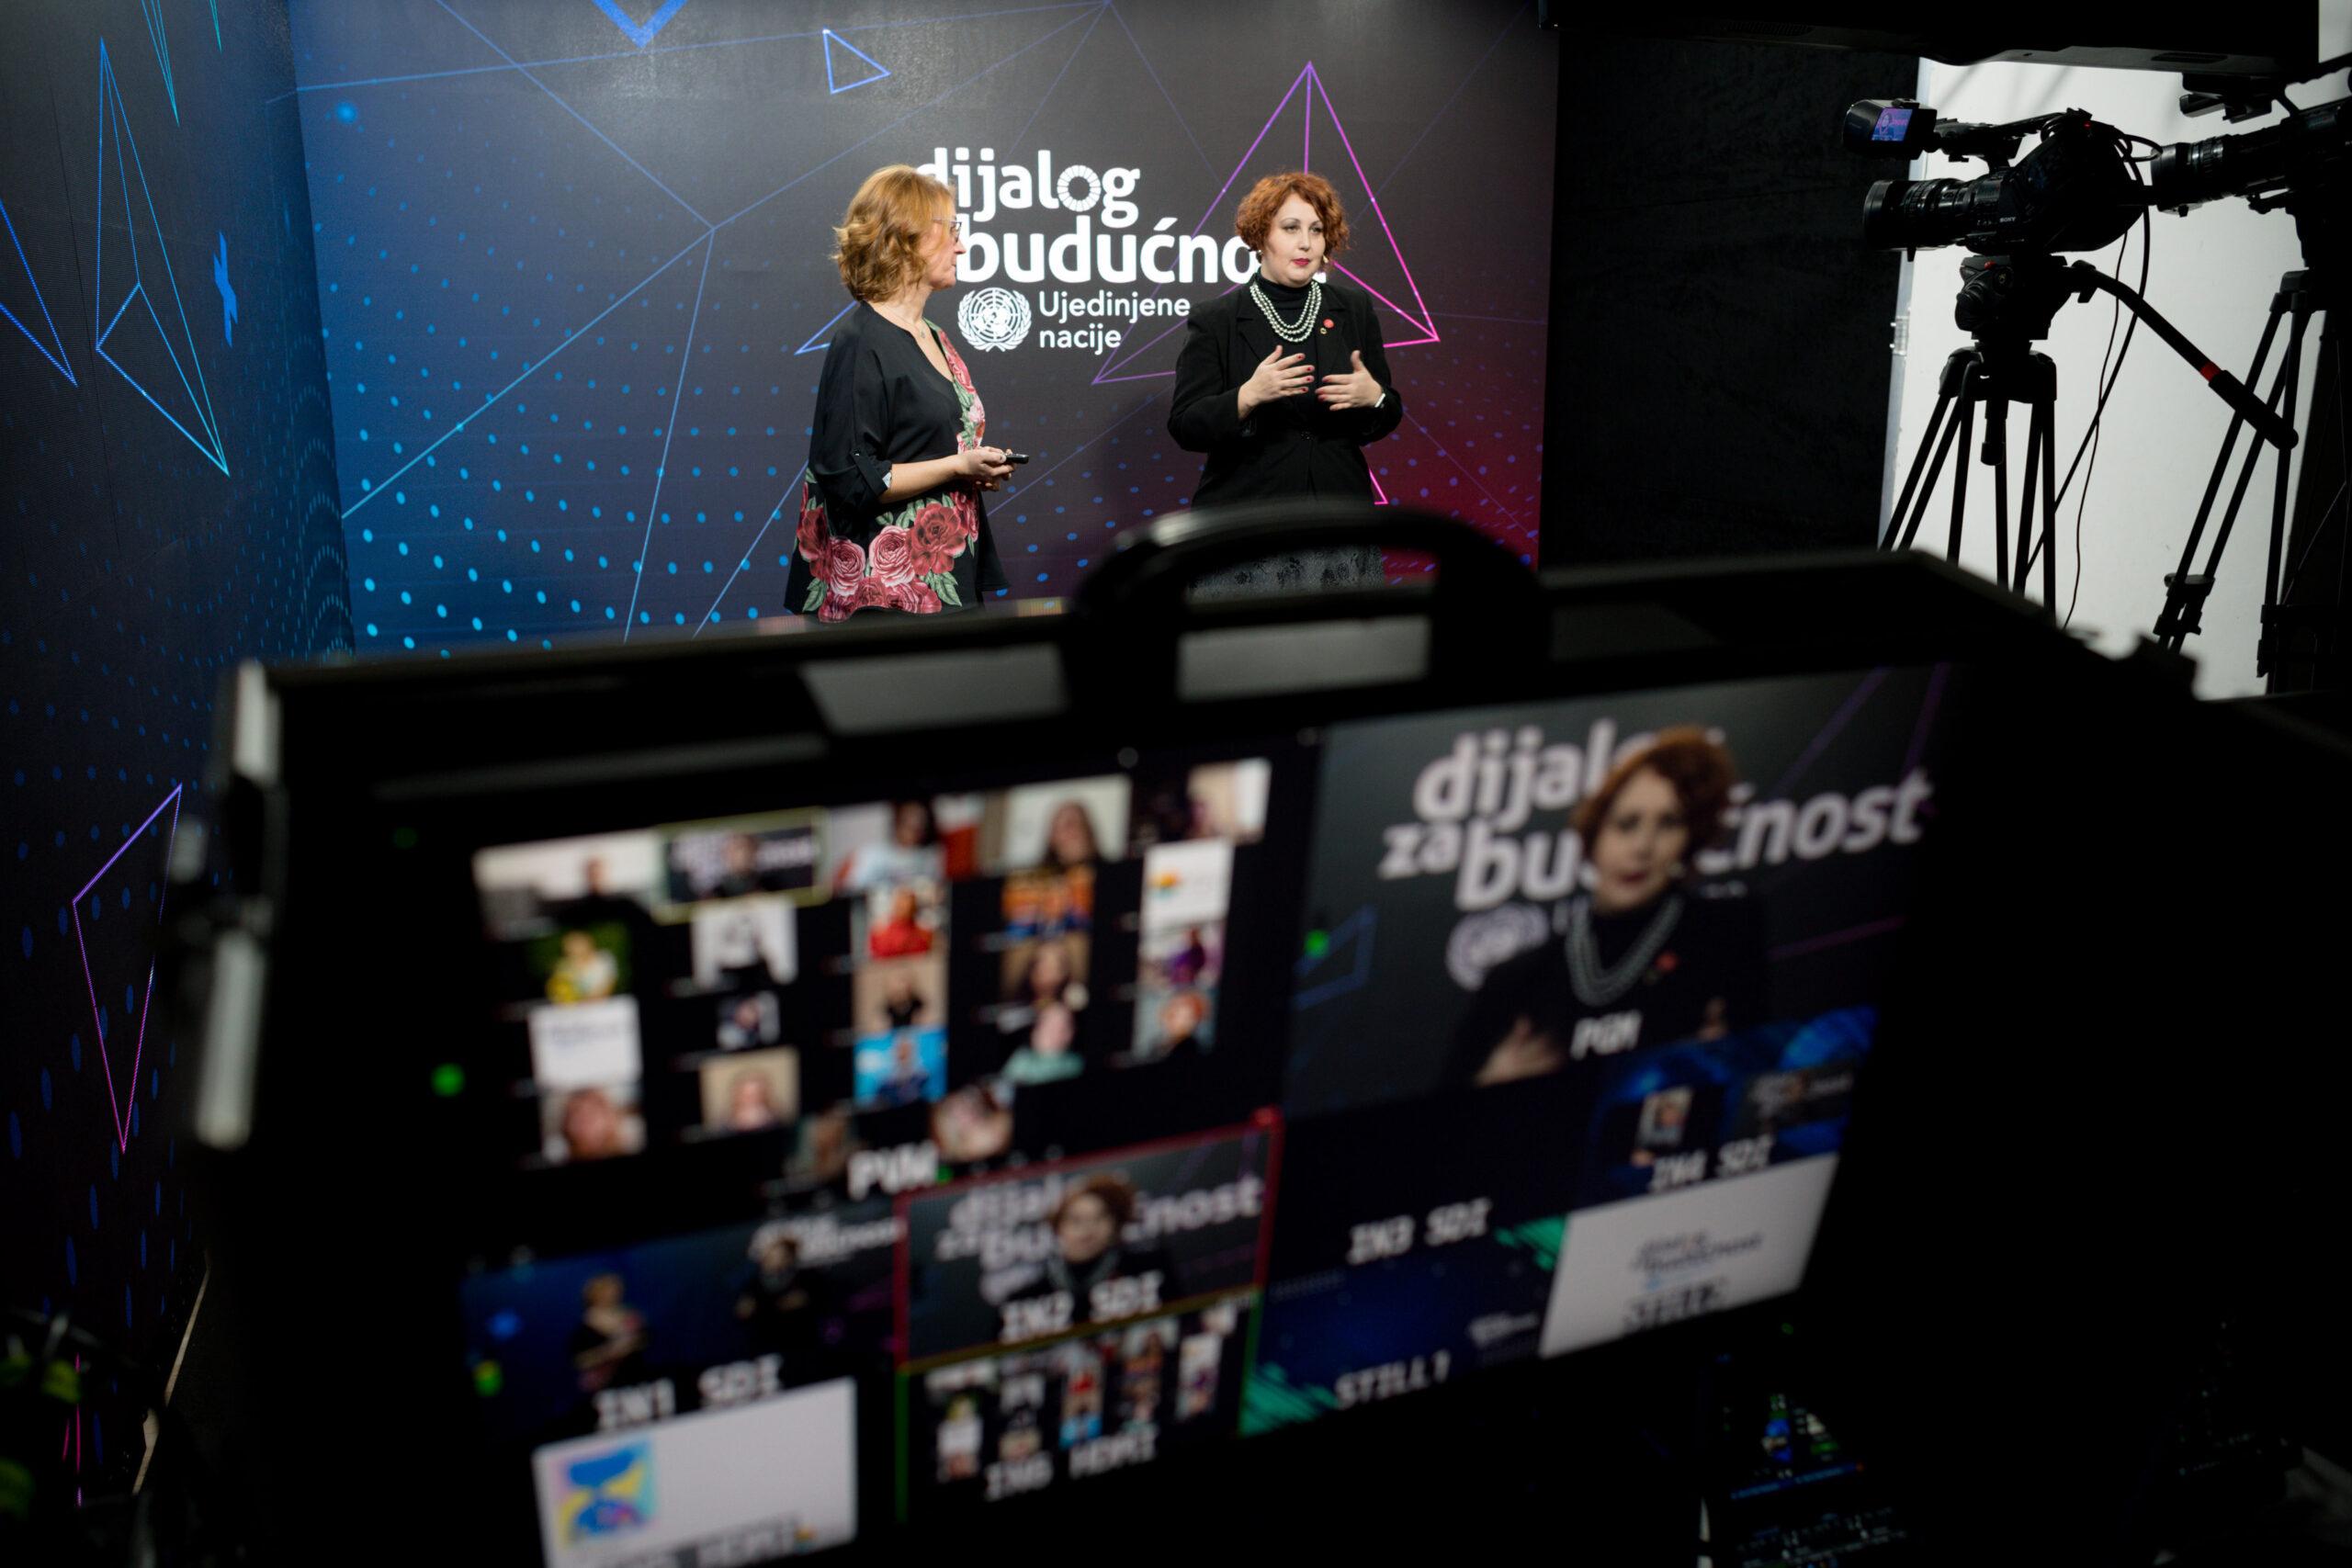 Dijalog za budućnost – deseti onlajn edukativni seminar: mediji i digitalne platforme kao oružje ženske borbe